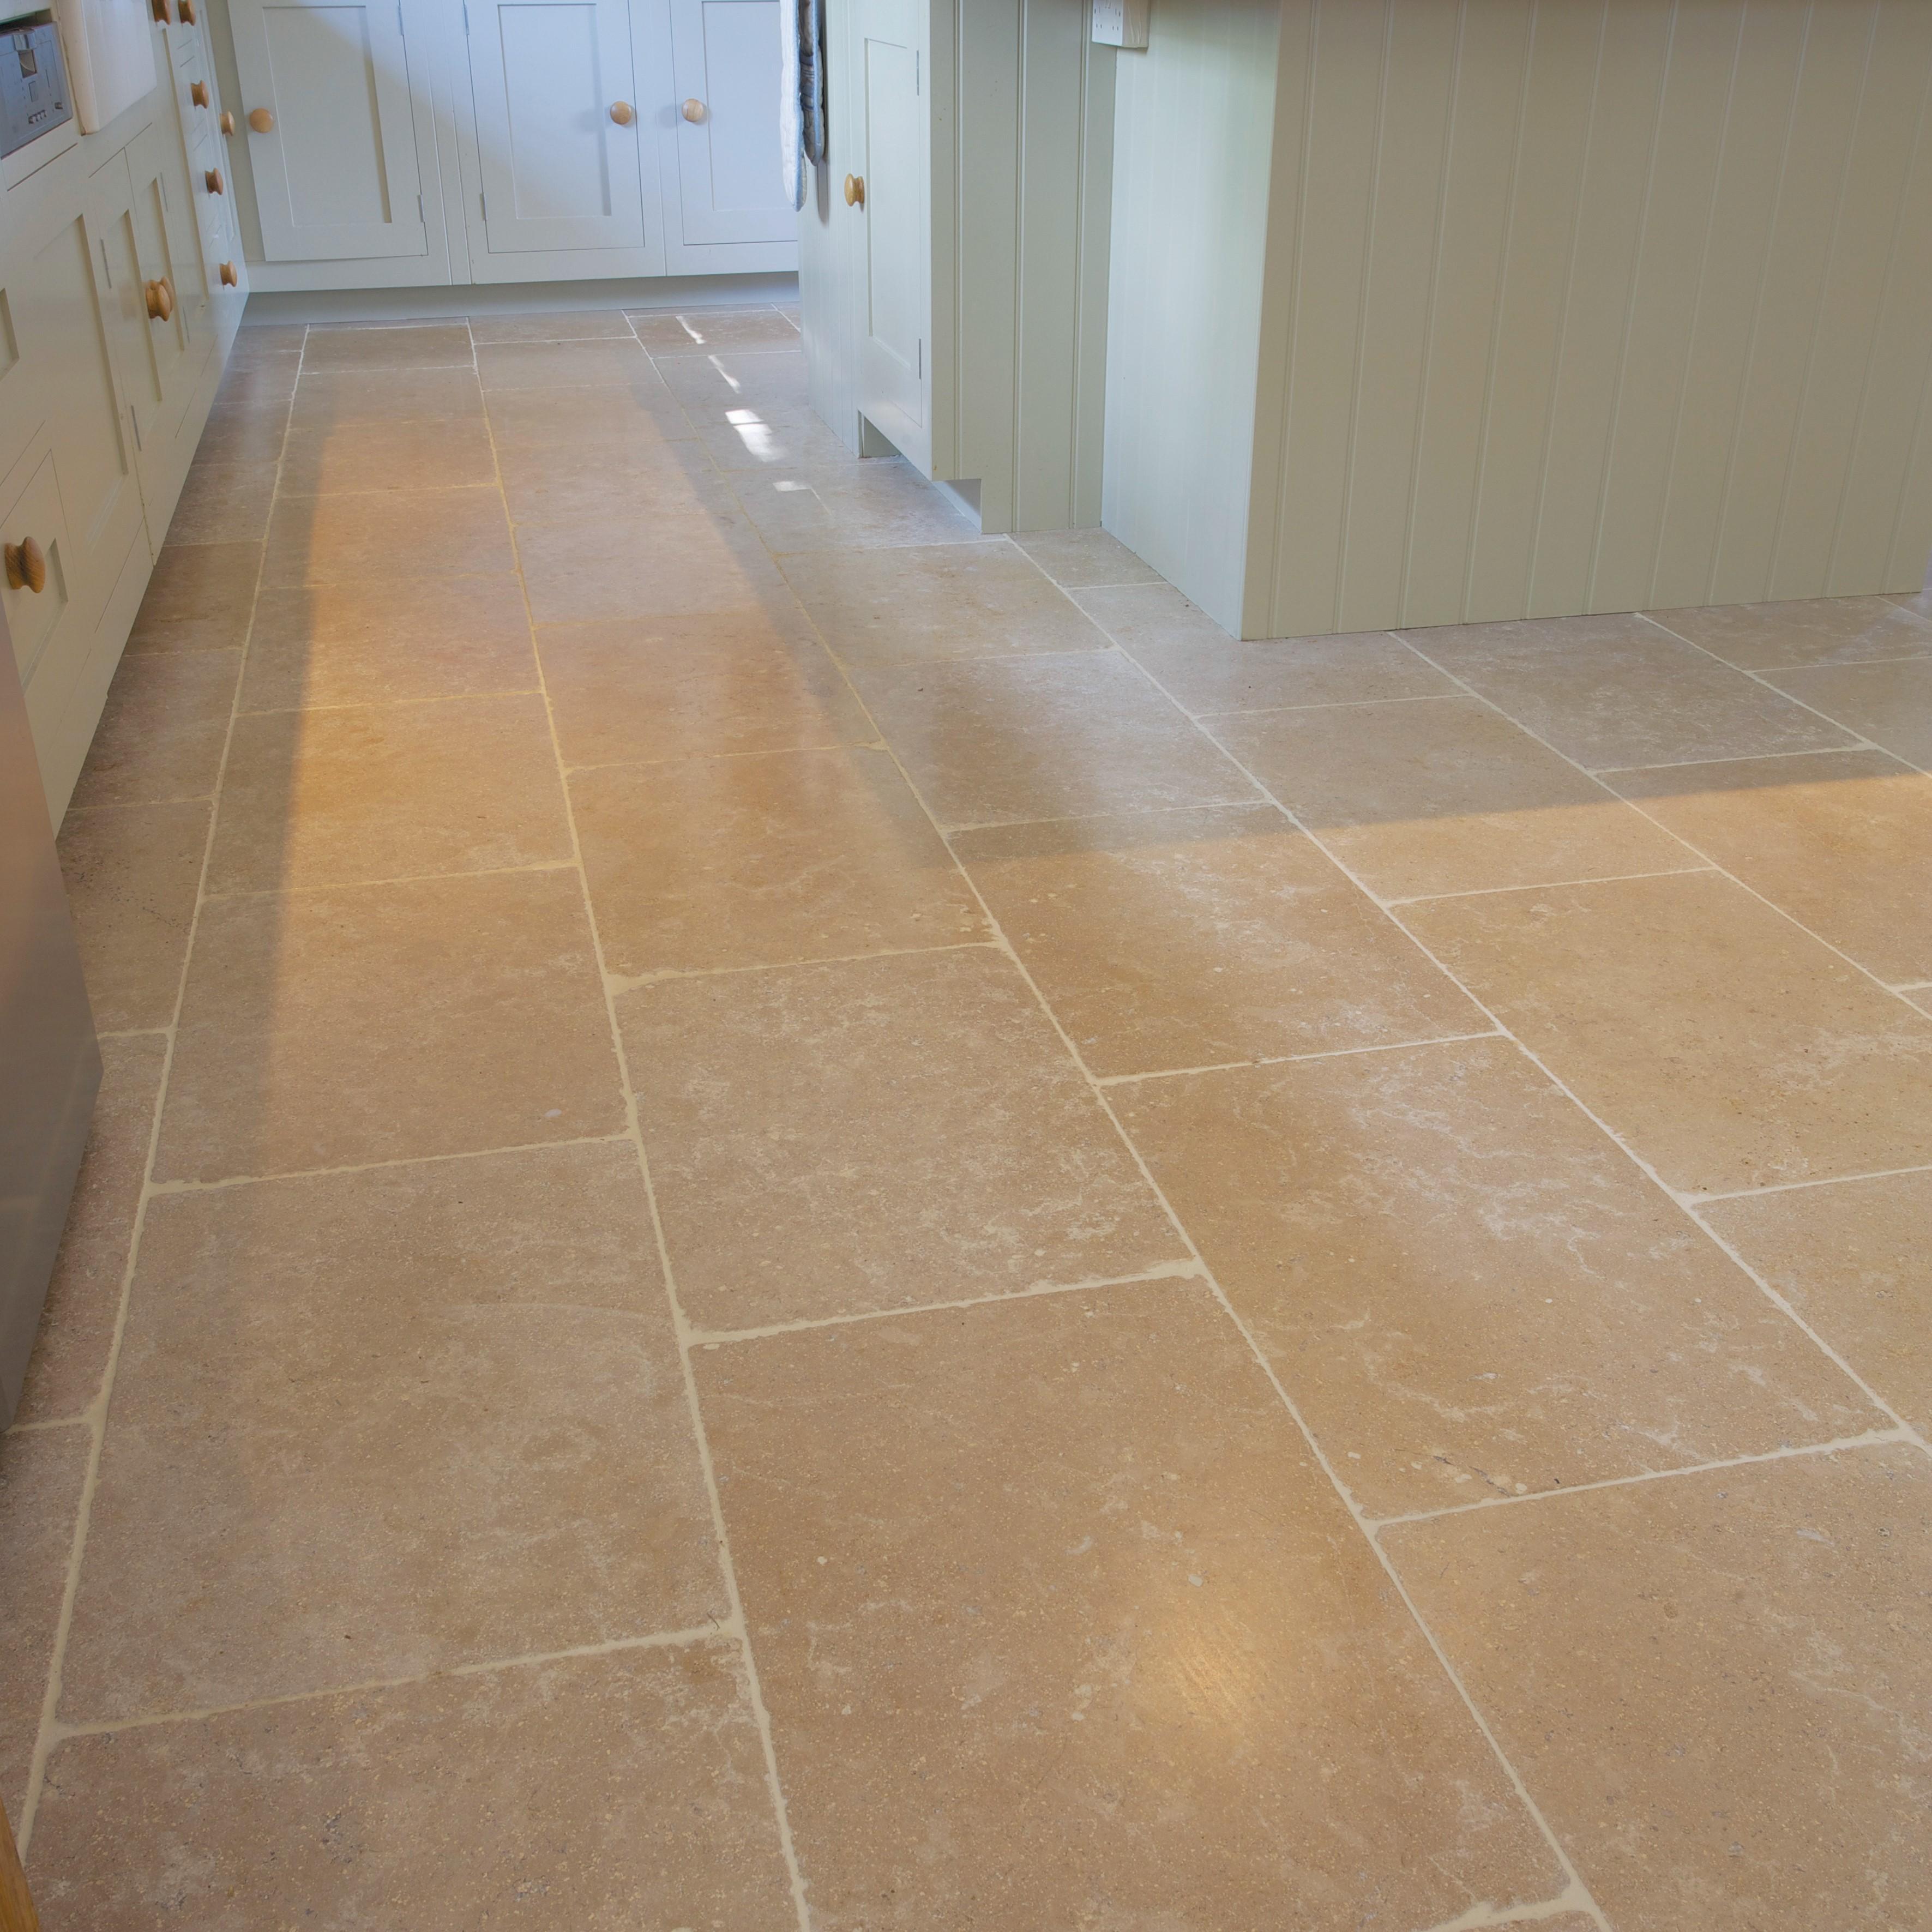 Ca pietra limestone hamlet tumbled edinburgh tile studio bespoke slabs available dailygadgetfo Choice Image